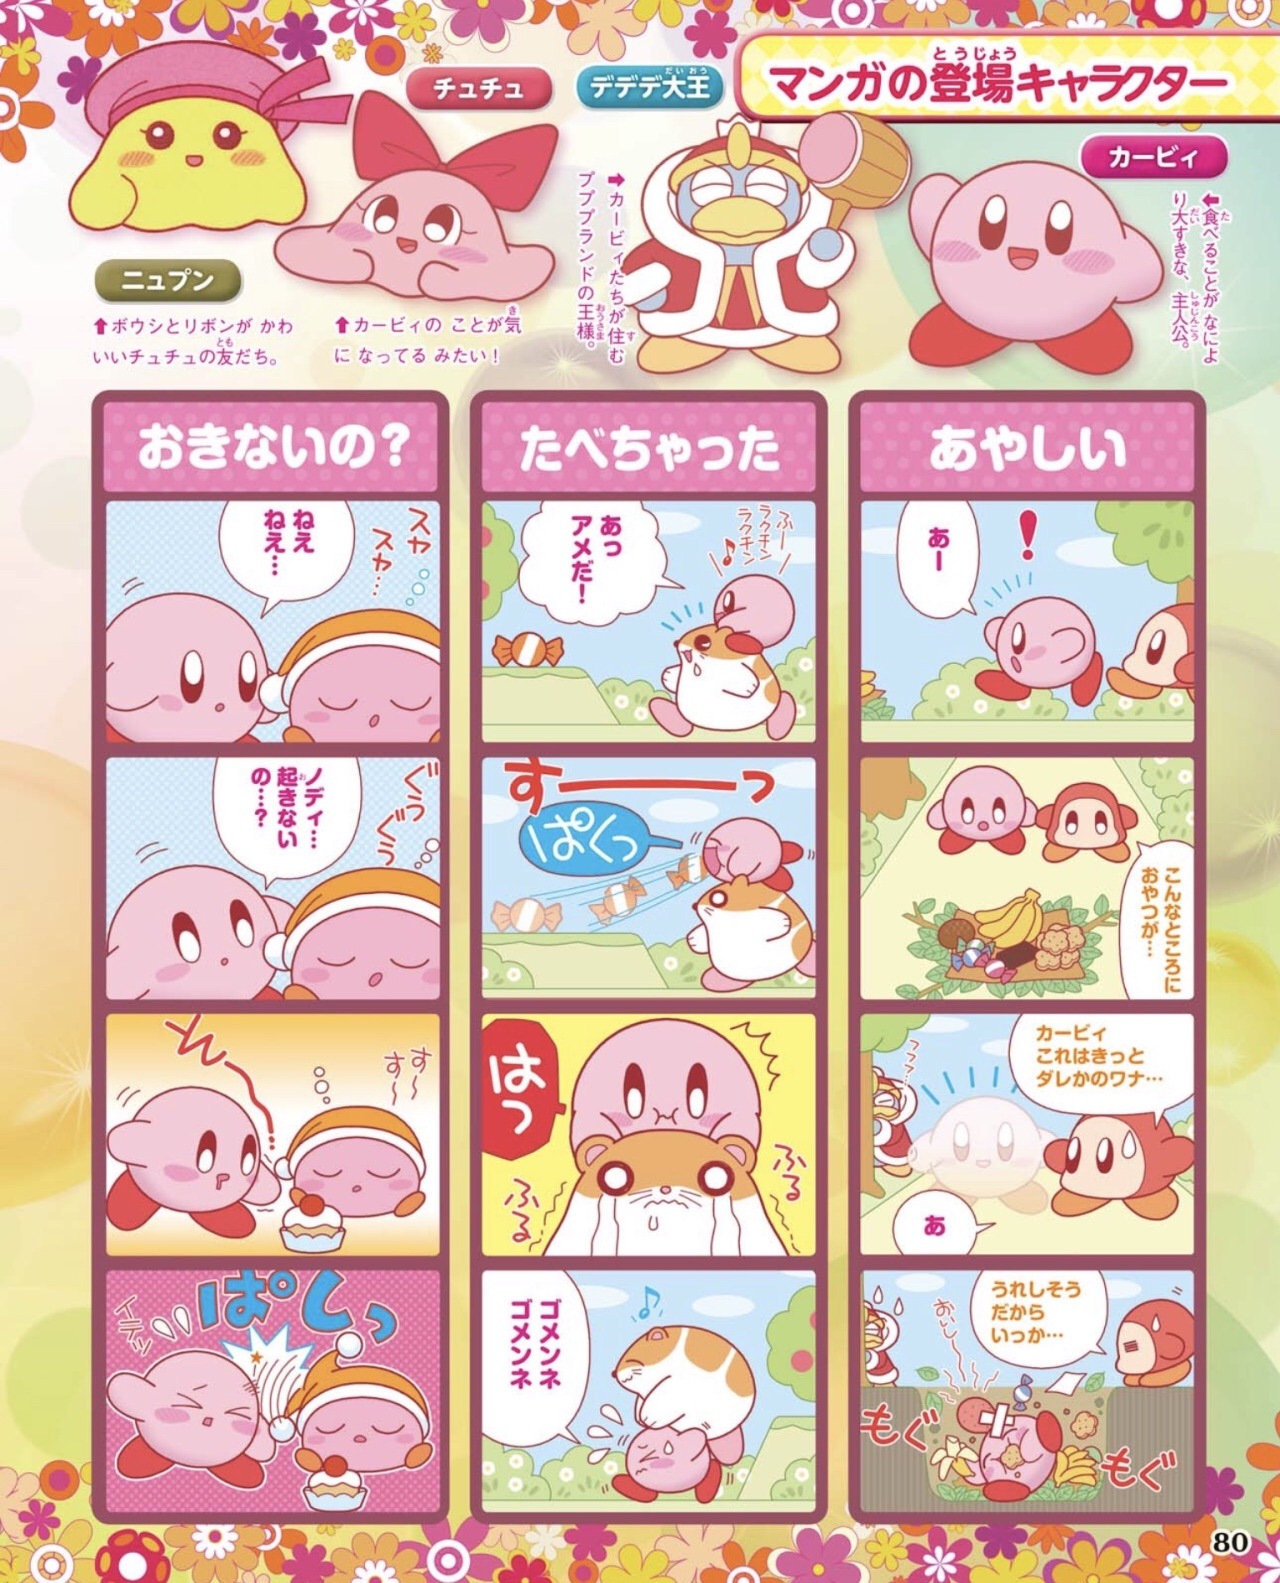 Kirby (character) - Wikipedia